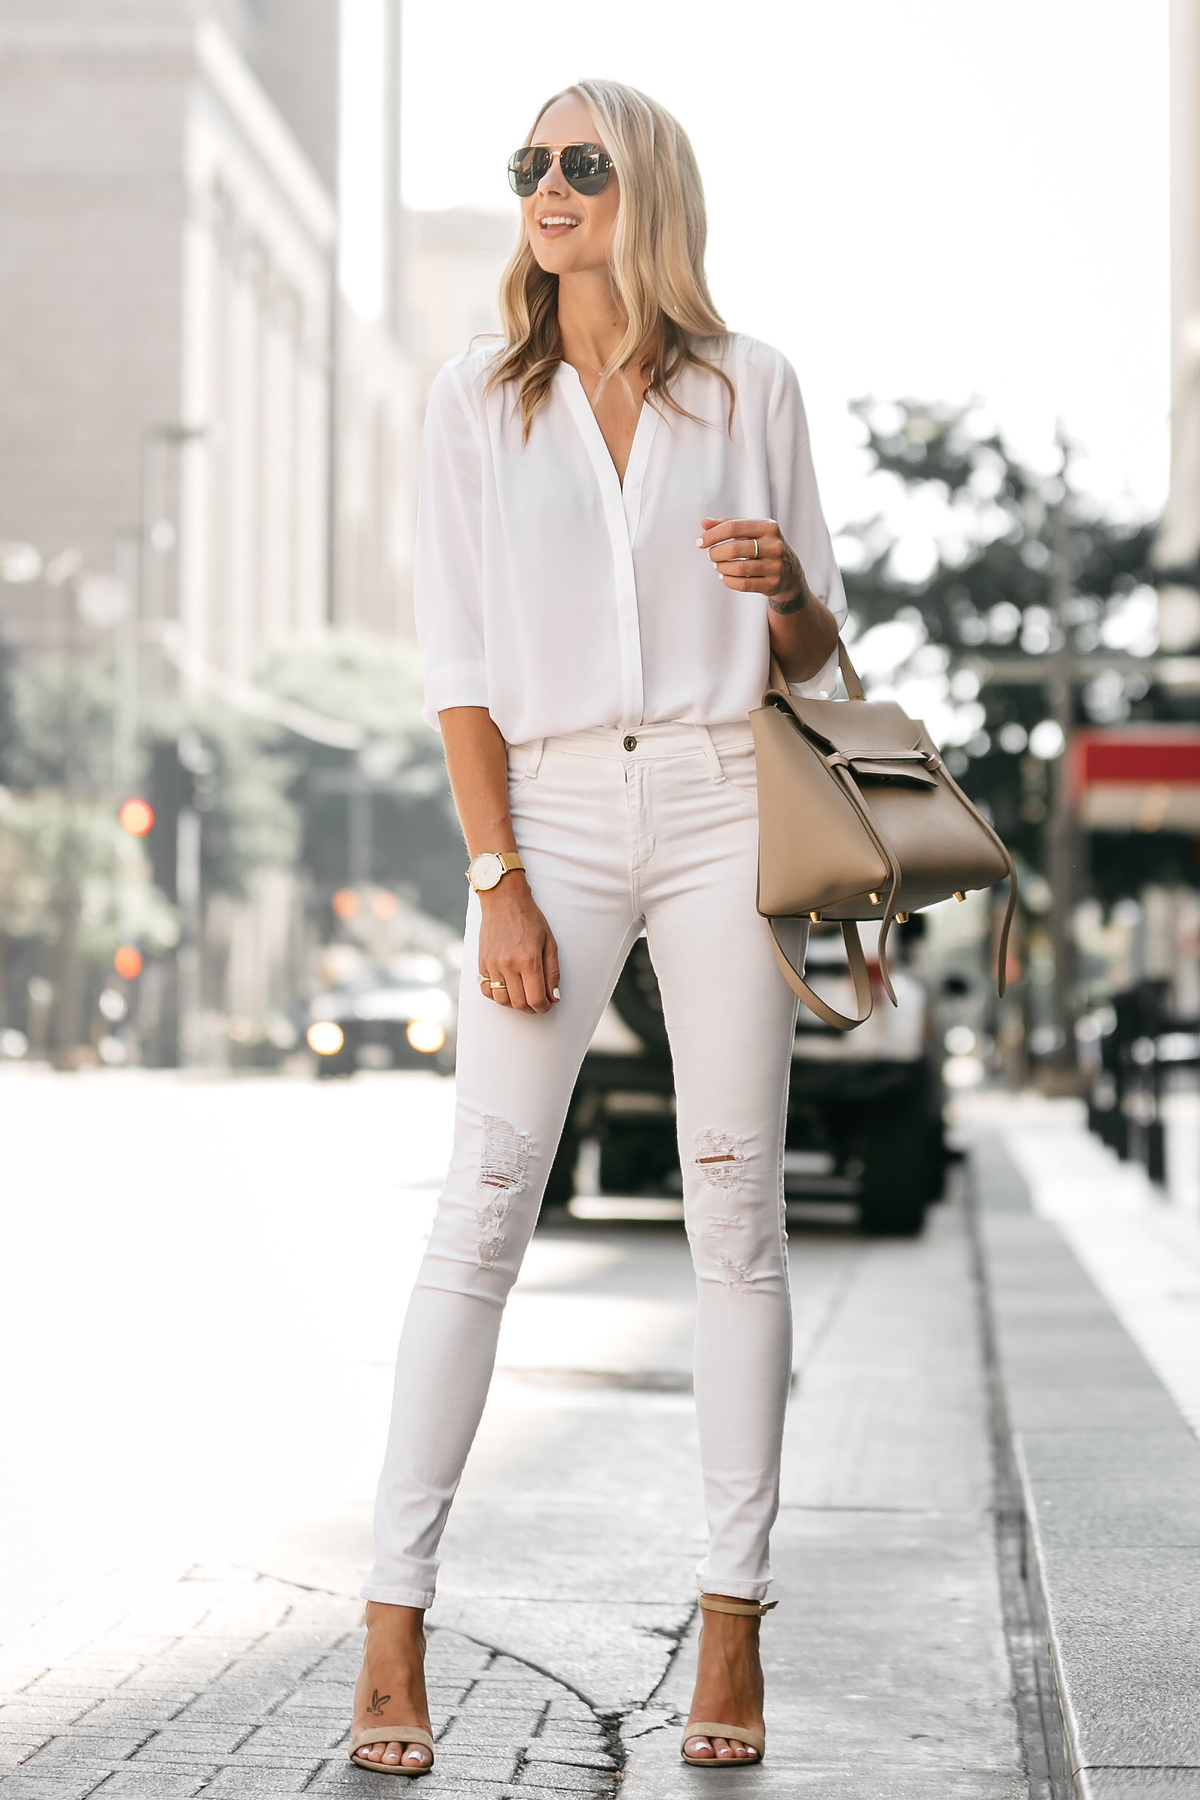 Fashion Jackson, Dallas Blogger, Fashion Blogger, Street Style, White Button-Down Blouse, White Ripped Skinny Jeans, Celine Belt Bag, Steve Madden Carrson Ankle Strap Heeled Sandals, Celine Aviator Sunglasses